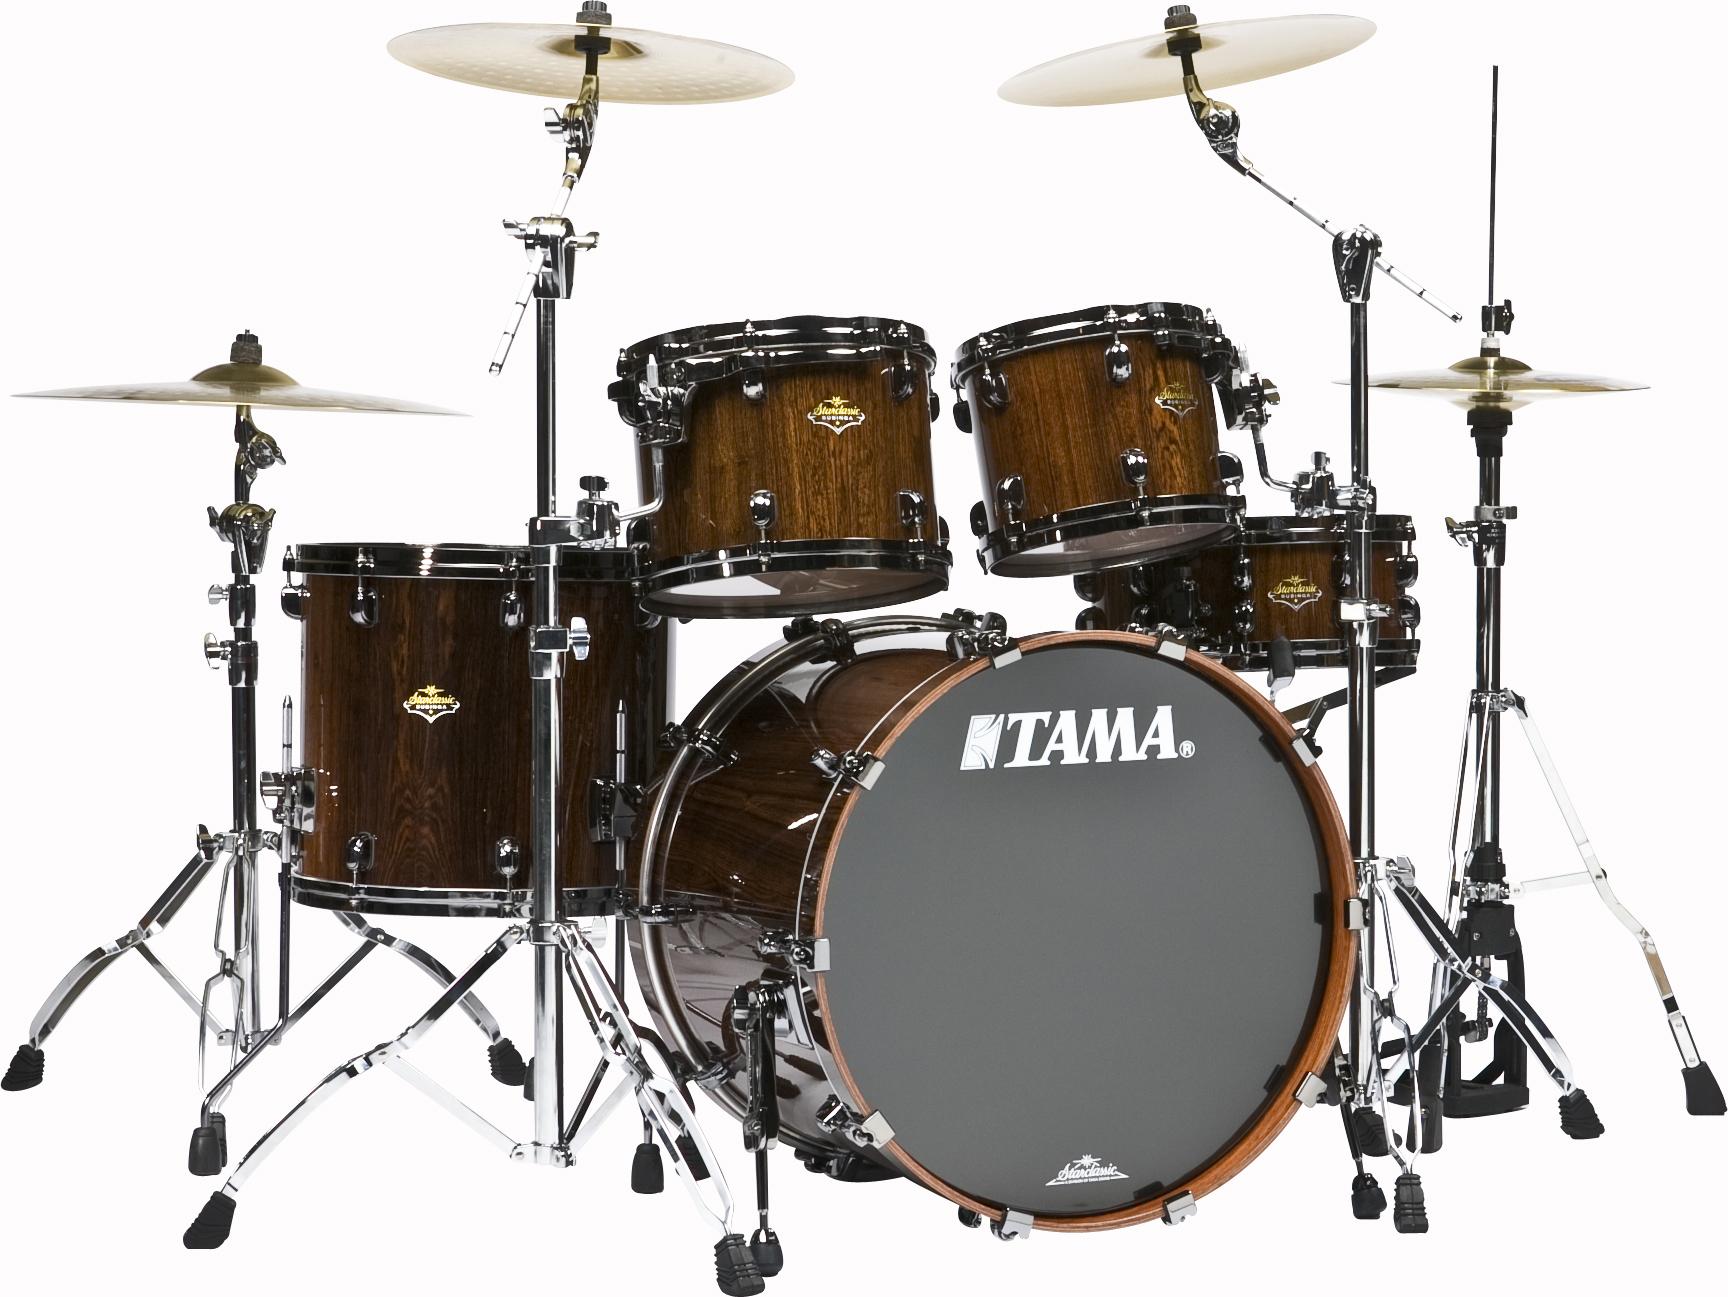 musicworks drums percussion rock drum kits rock kits tama starclassic bubinga elite 4. Black Bedroom Furniture Sets. Home Design Ideas